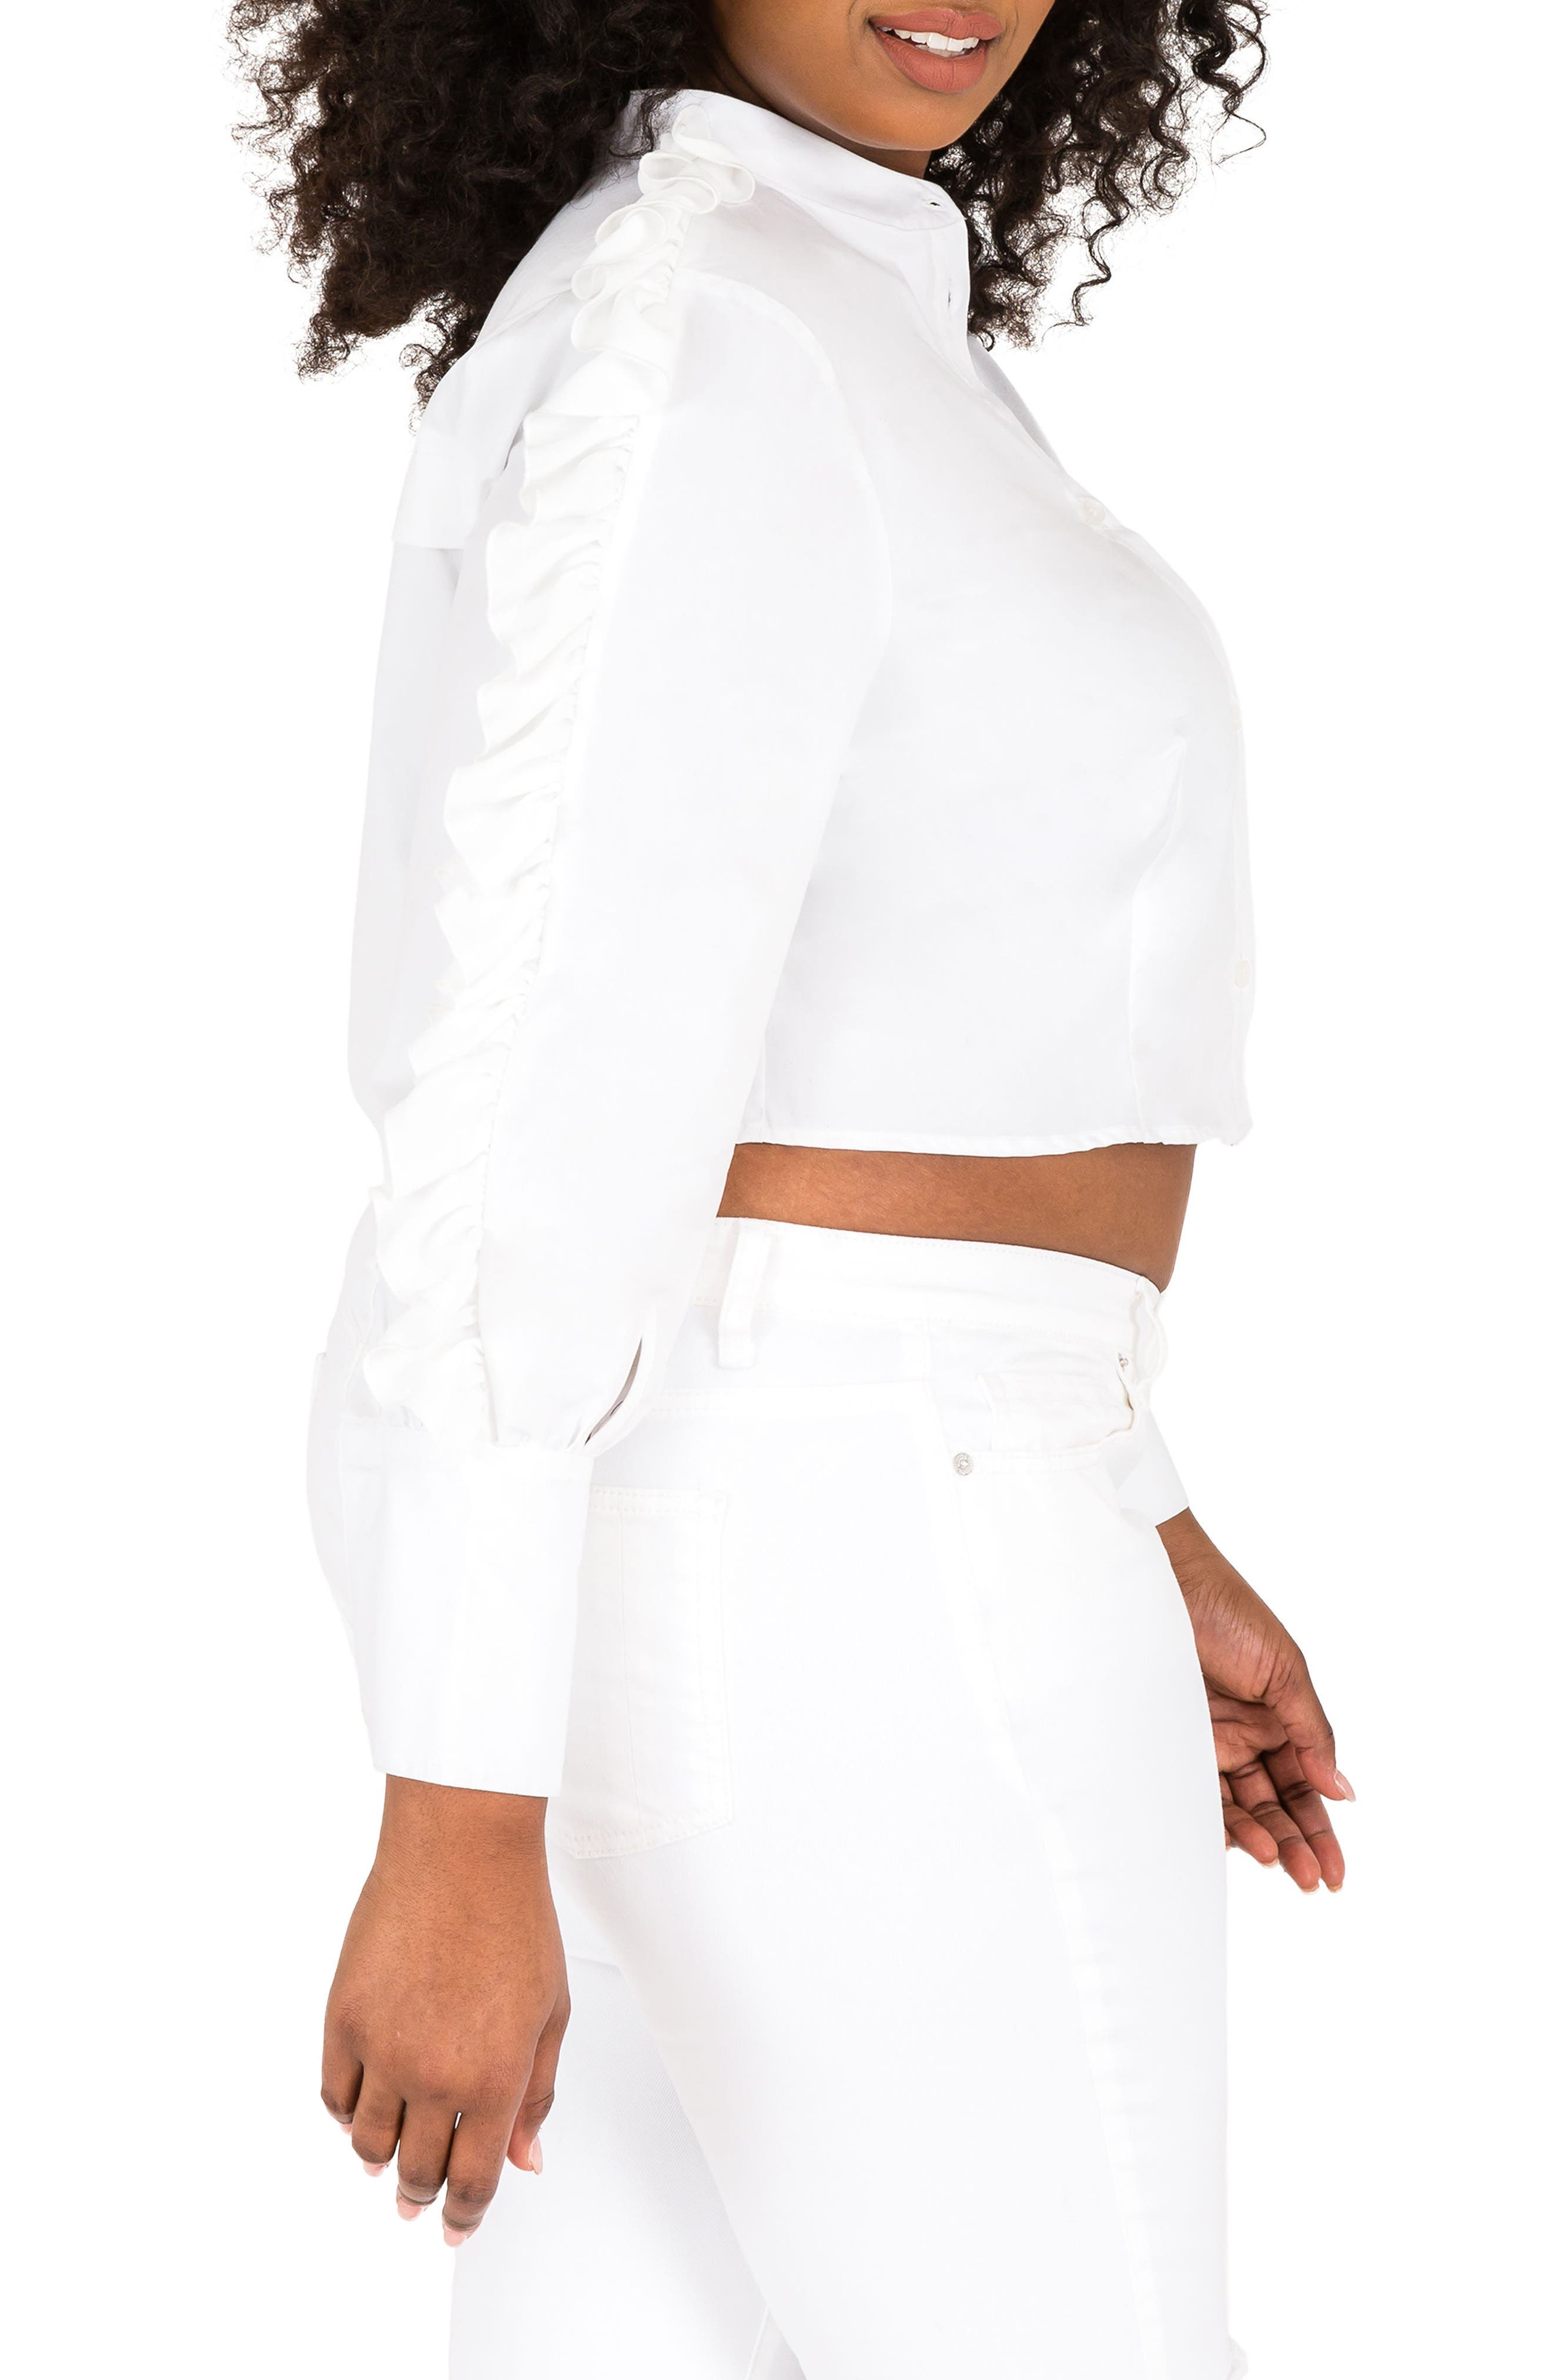 Mayasia Ruffle Sleeve Crop Shirt,                             Alternate thumbnail 3, color,                             WHITE